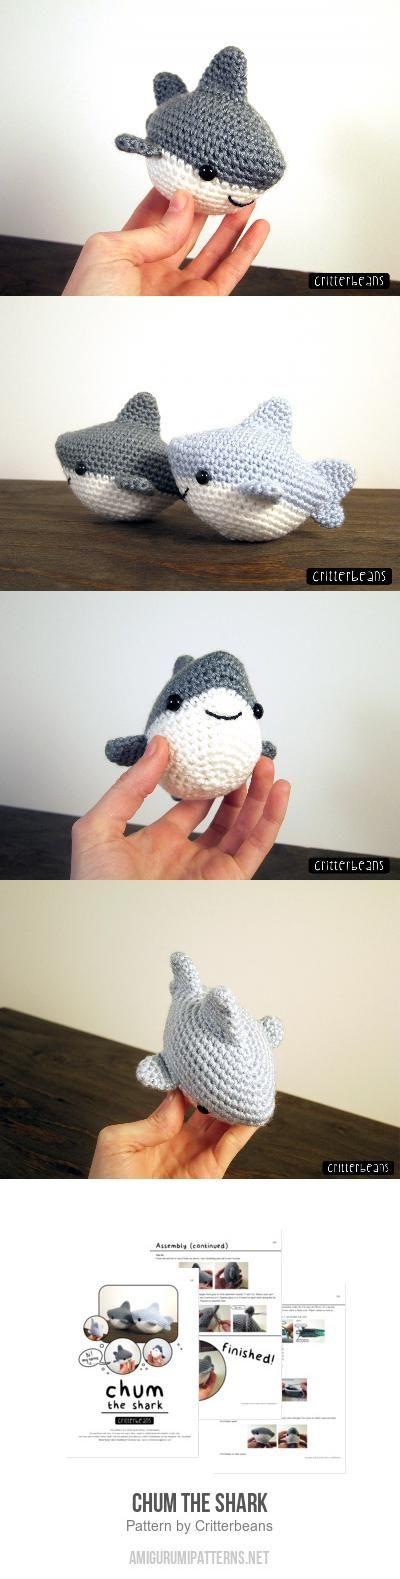 Chum the shark amigurumi pattern by Critterbeans | Tejido, Patrones ...